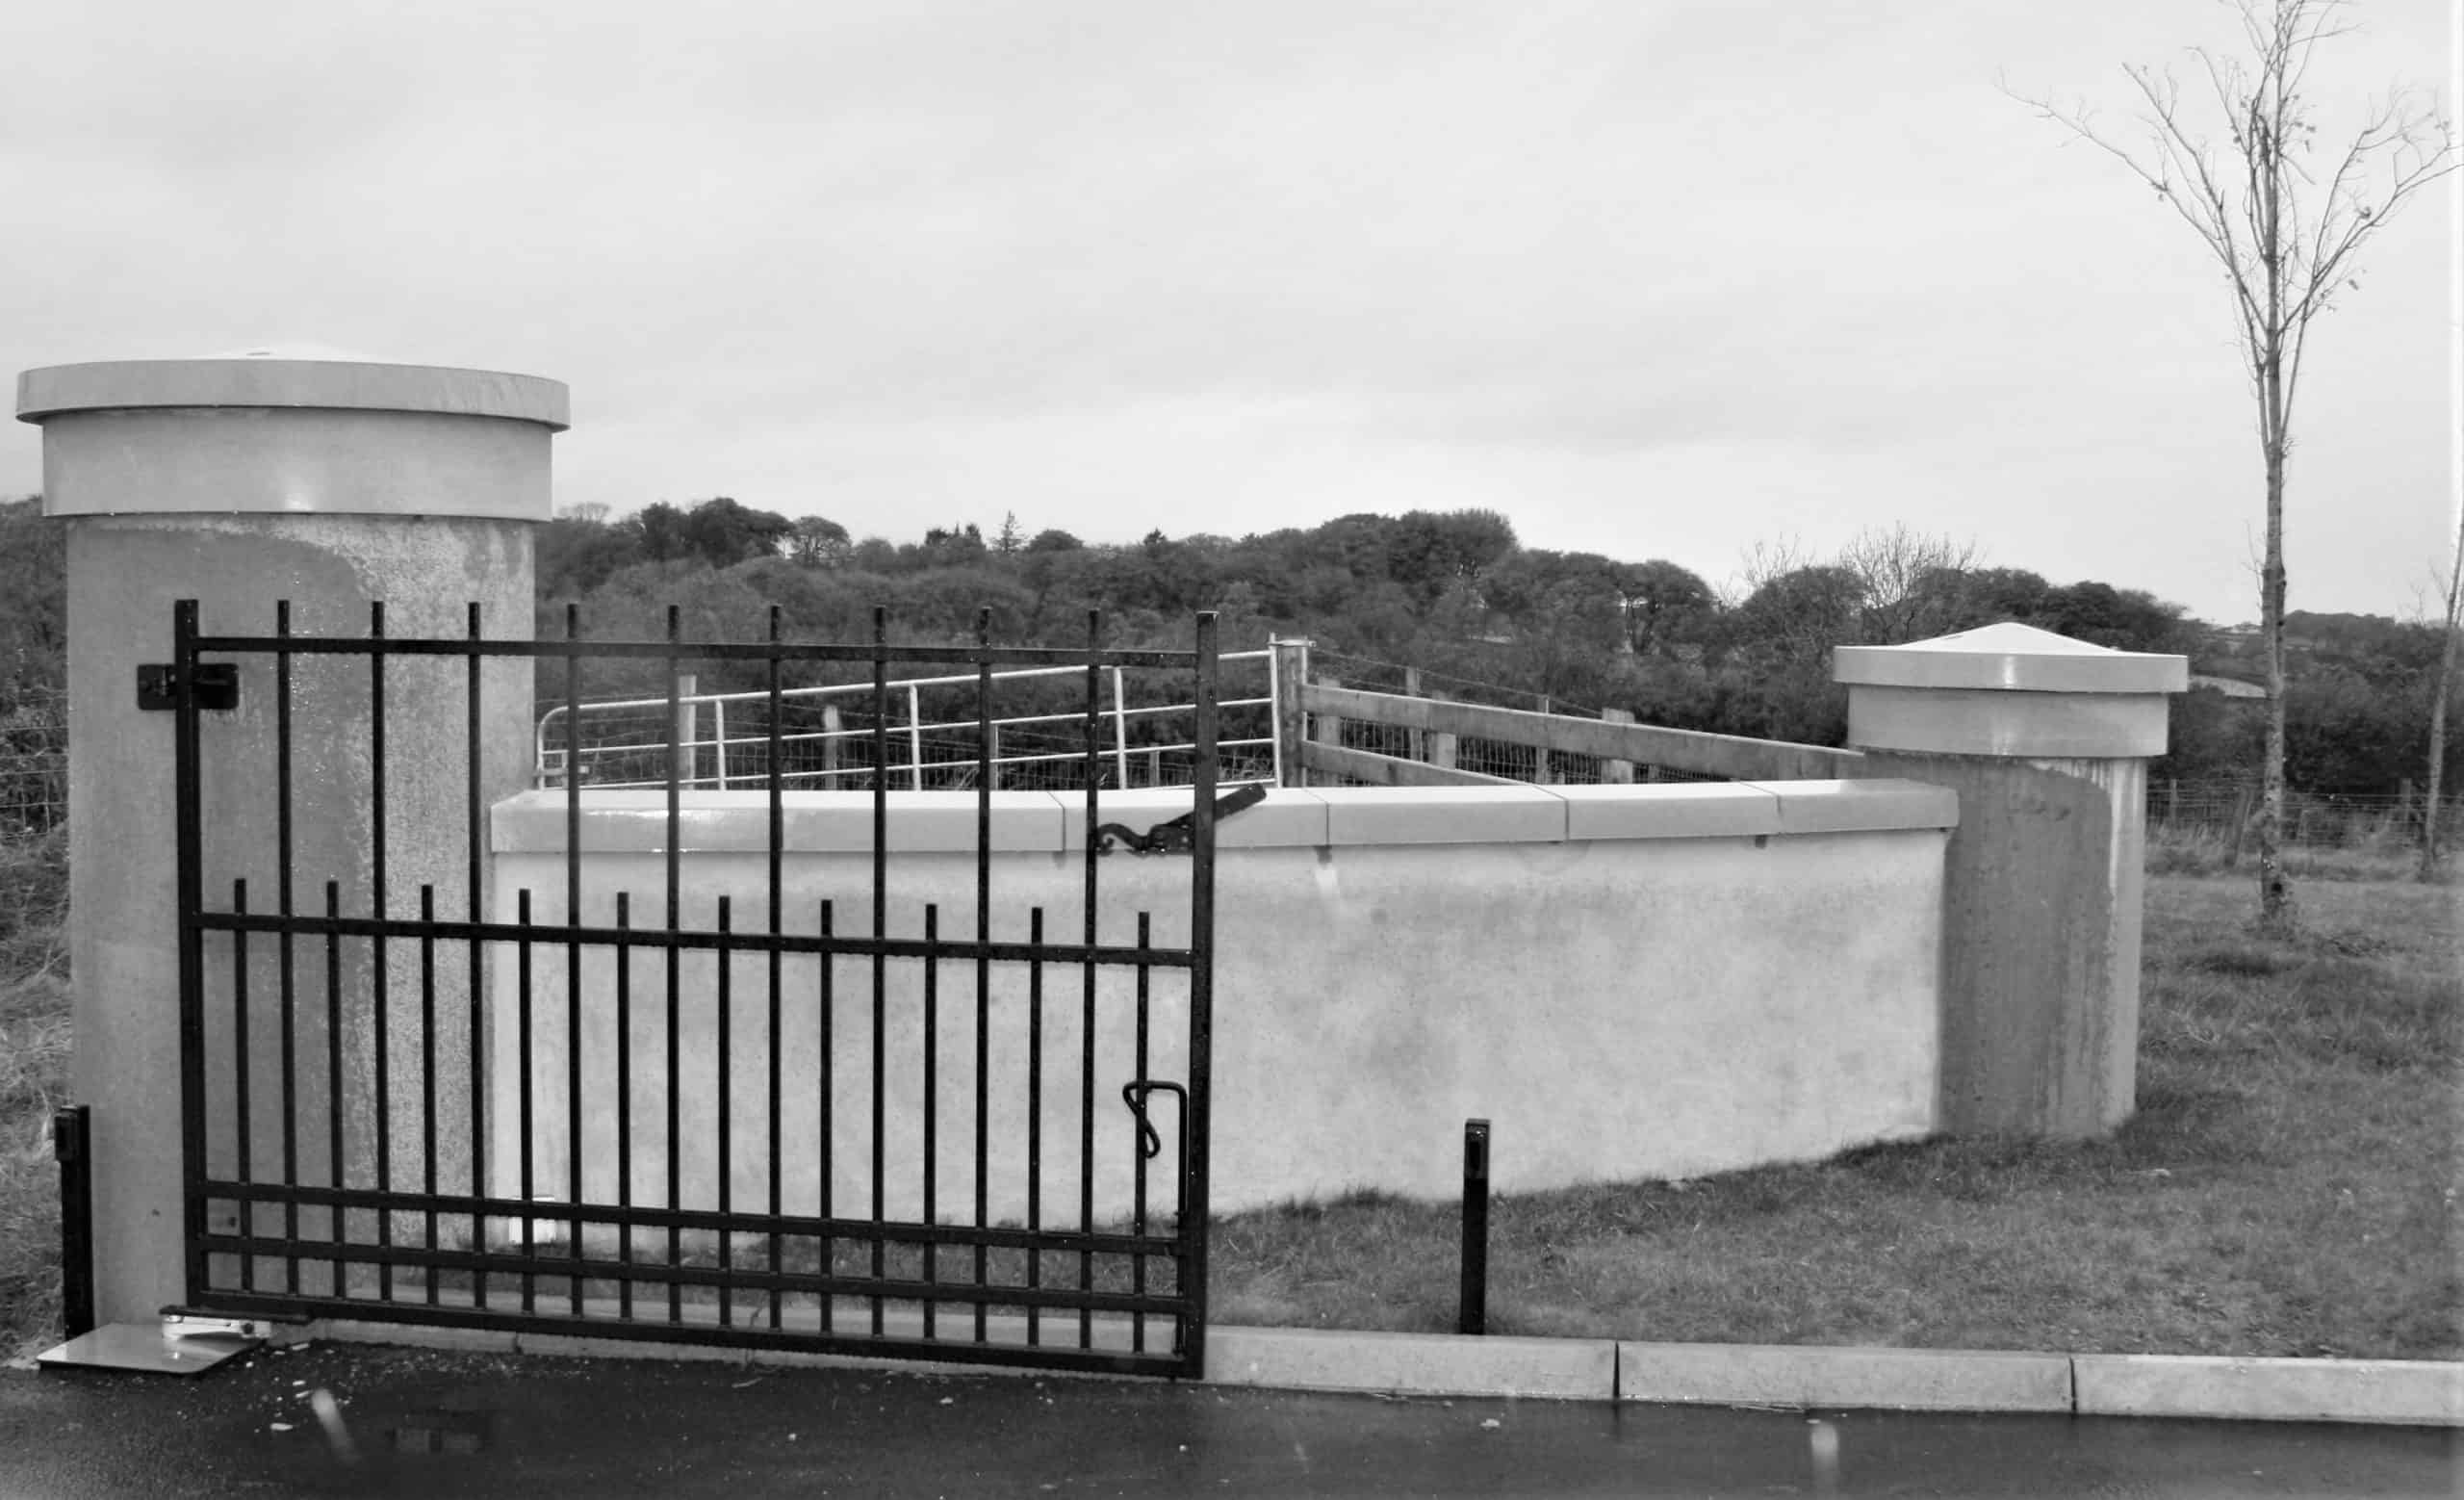 Killmartin - Entrance Peirs